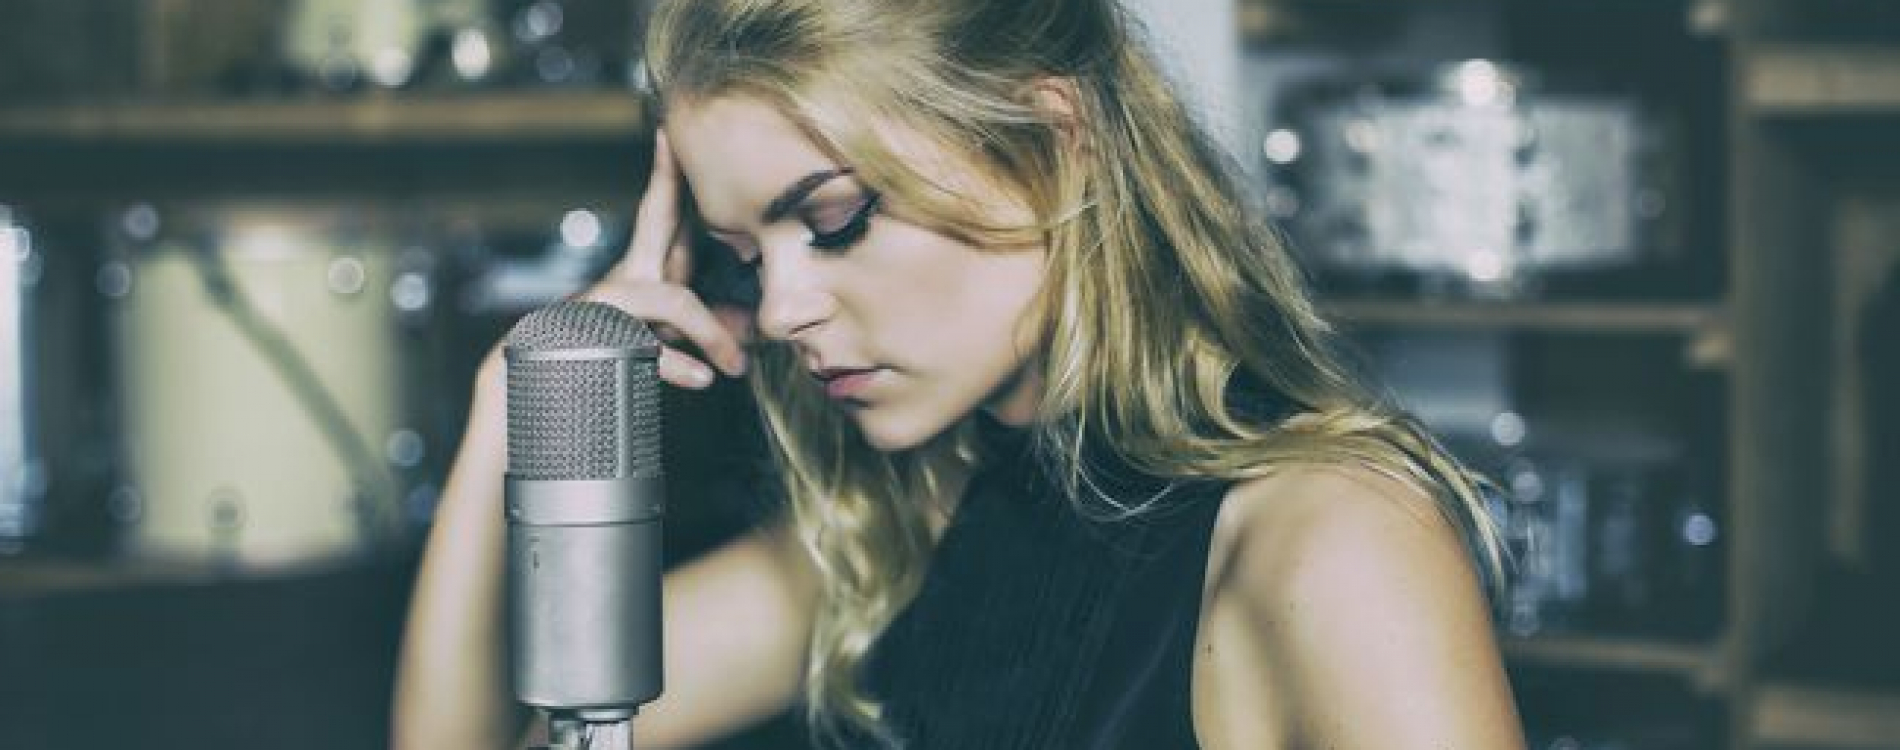 bekende zangeres Davine Michelle met microfoon